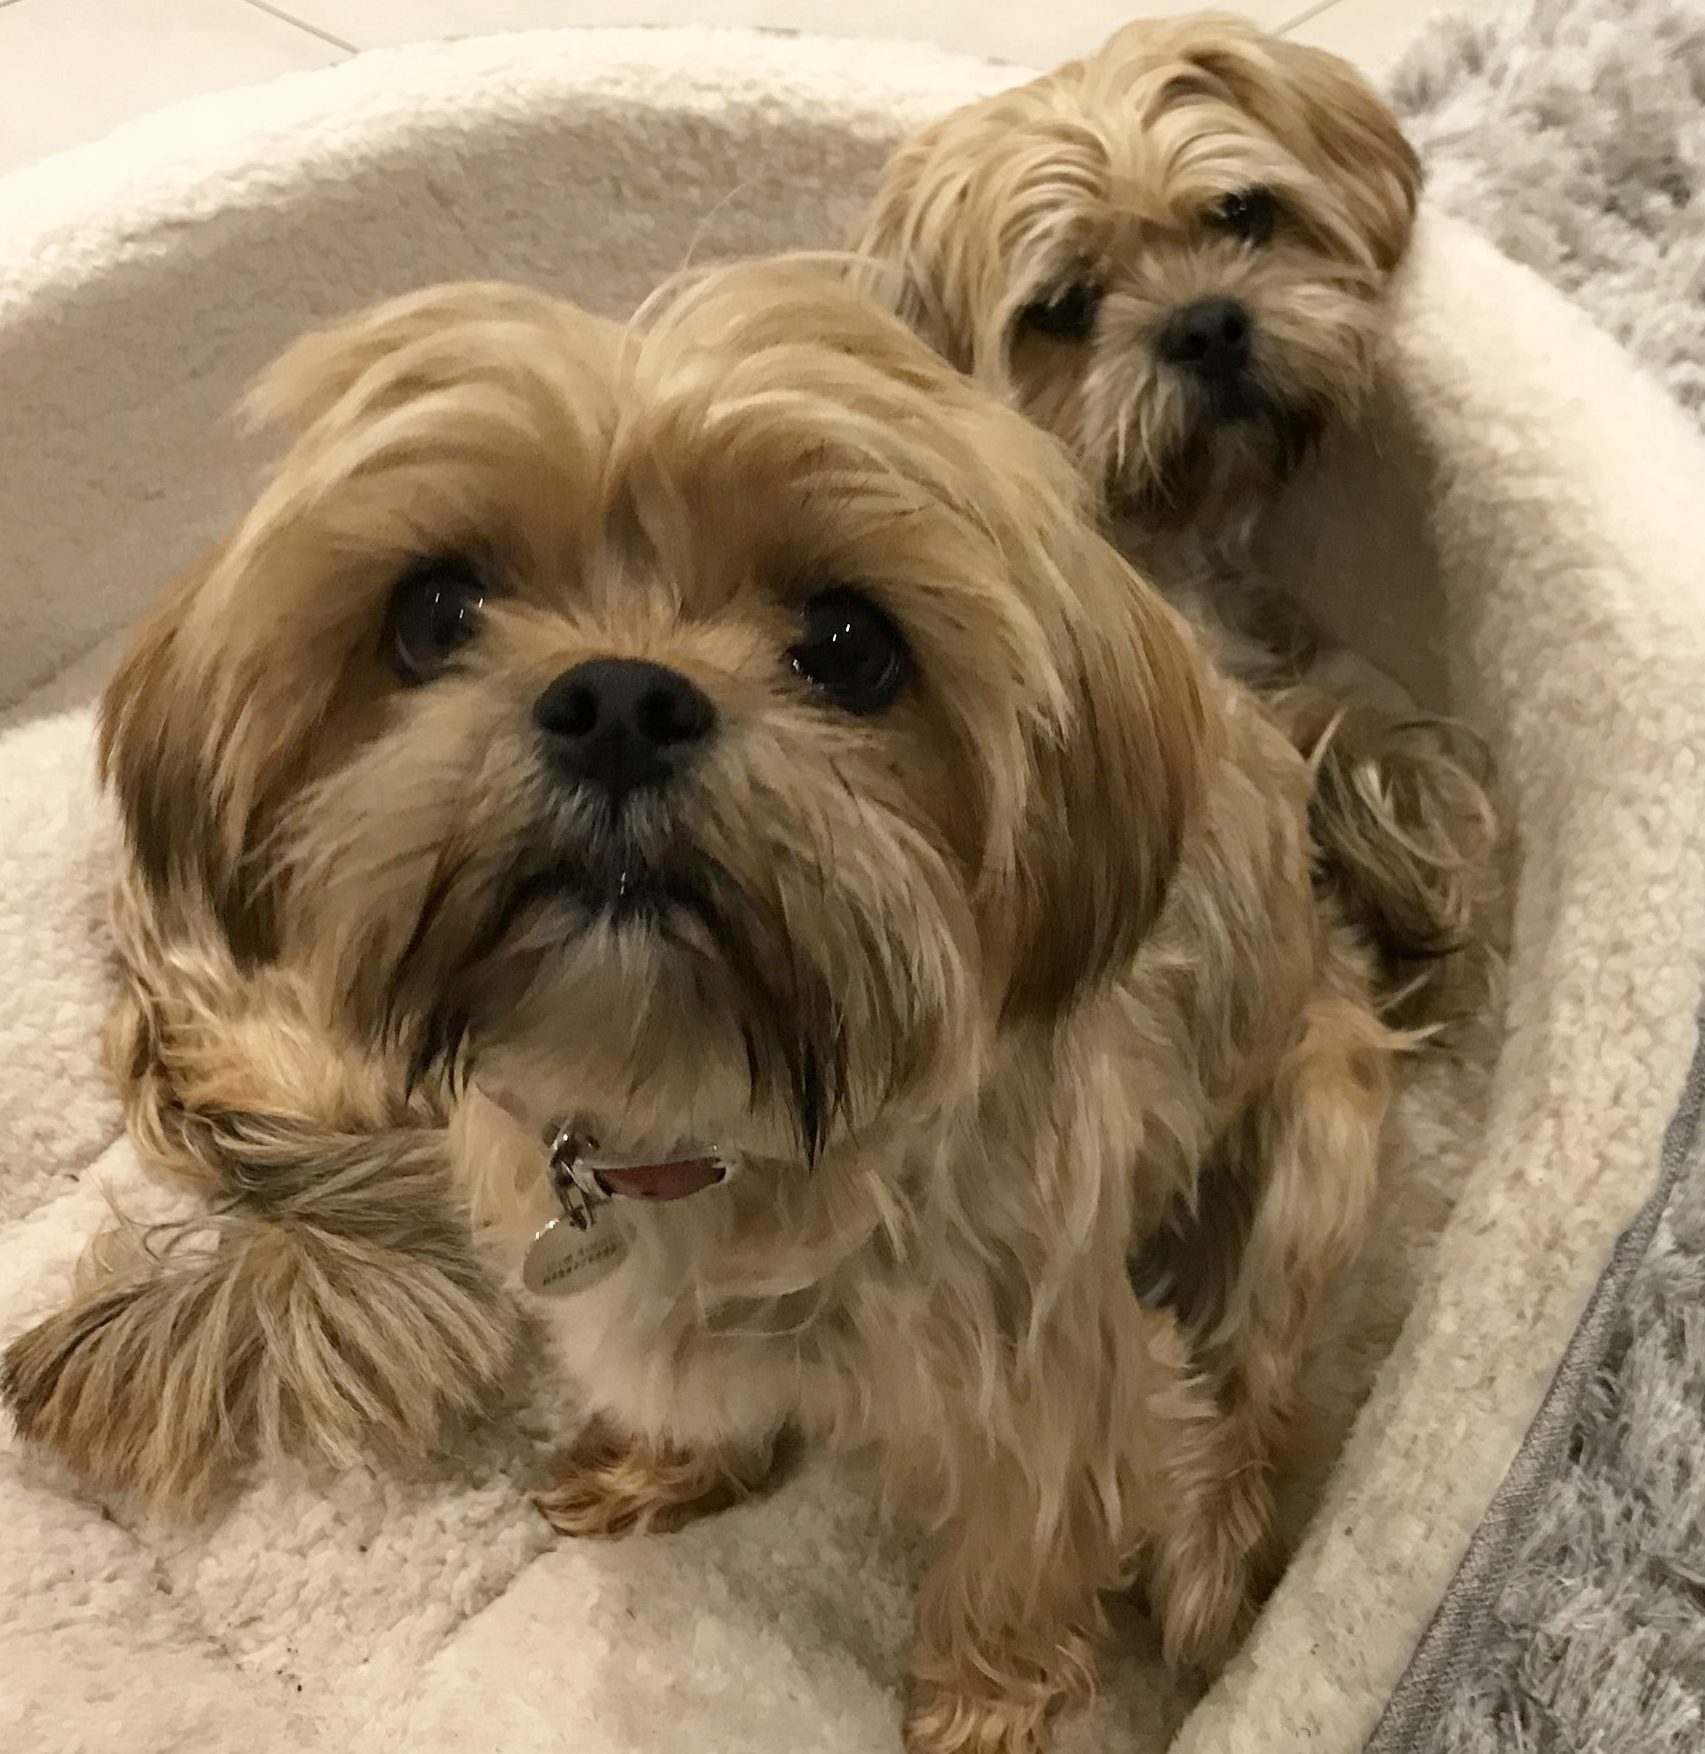 Booboo and Yogi